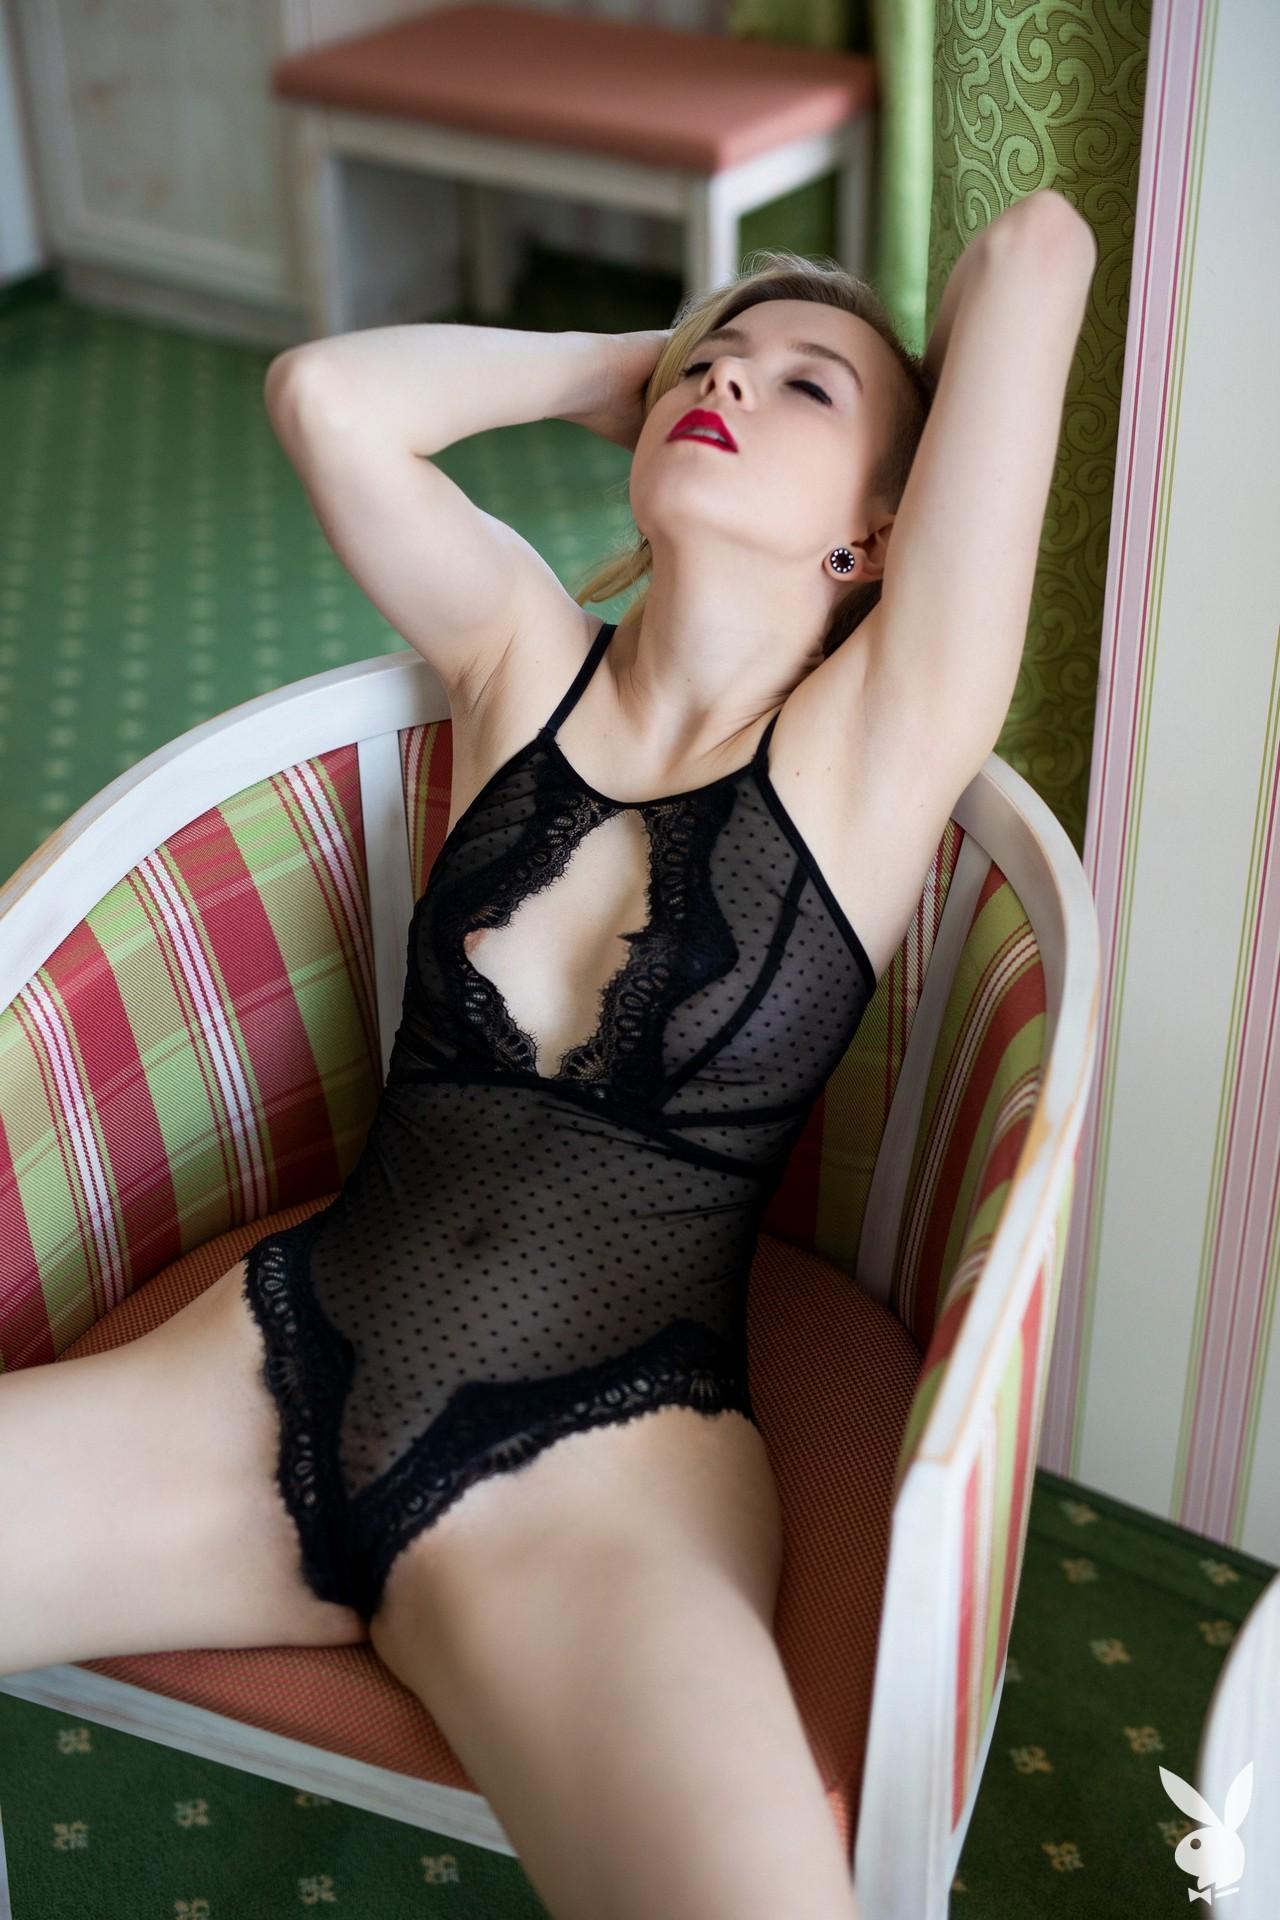 Emmi - Playboy photoshoot